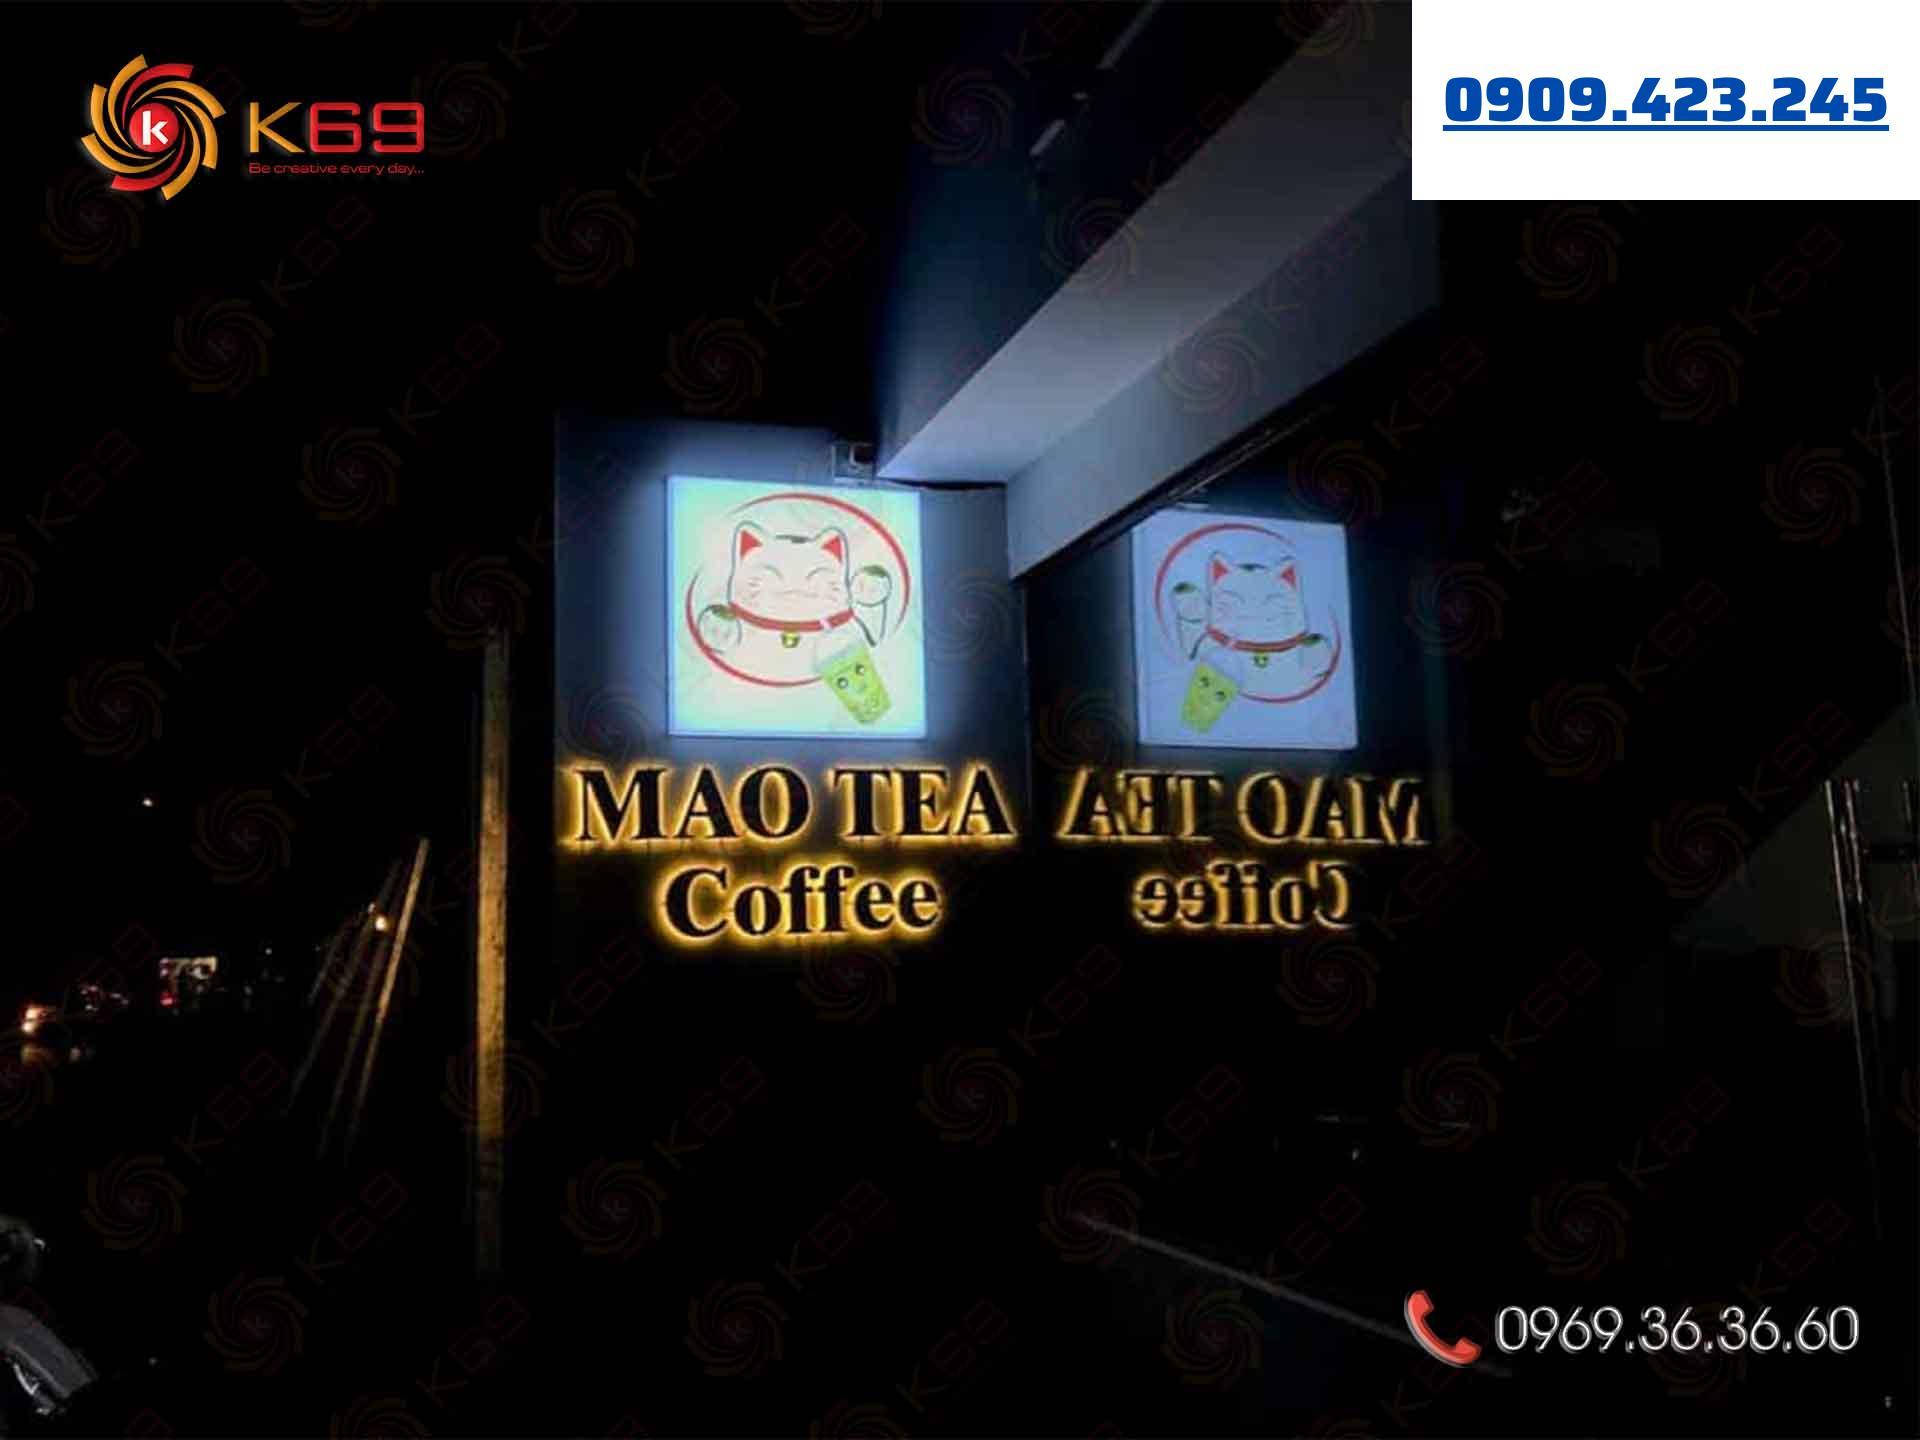 Mẫu bảng hiệu trà sữa MaoTea tại K69adv